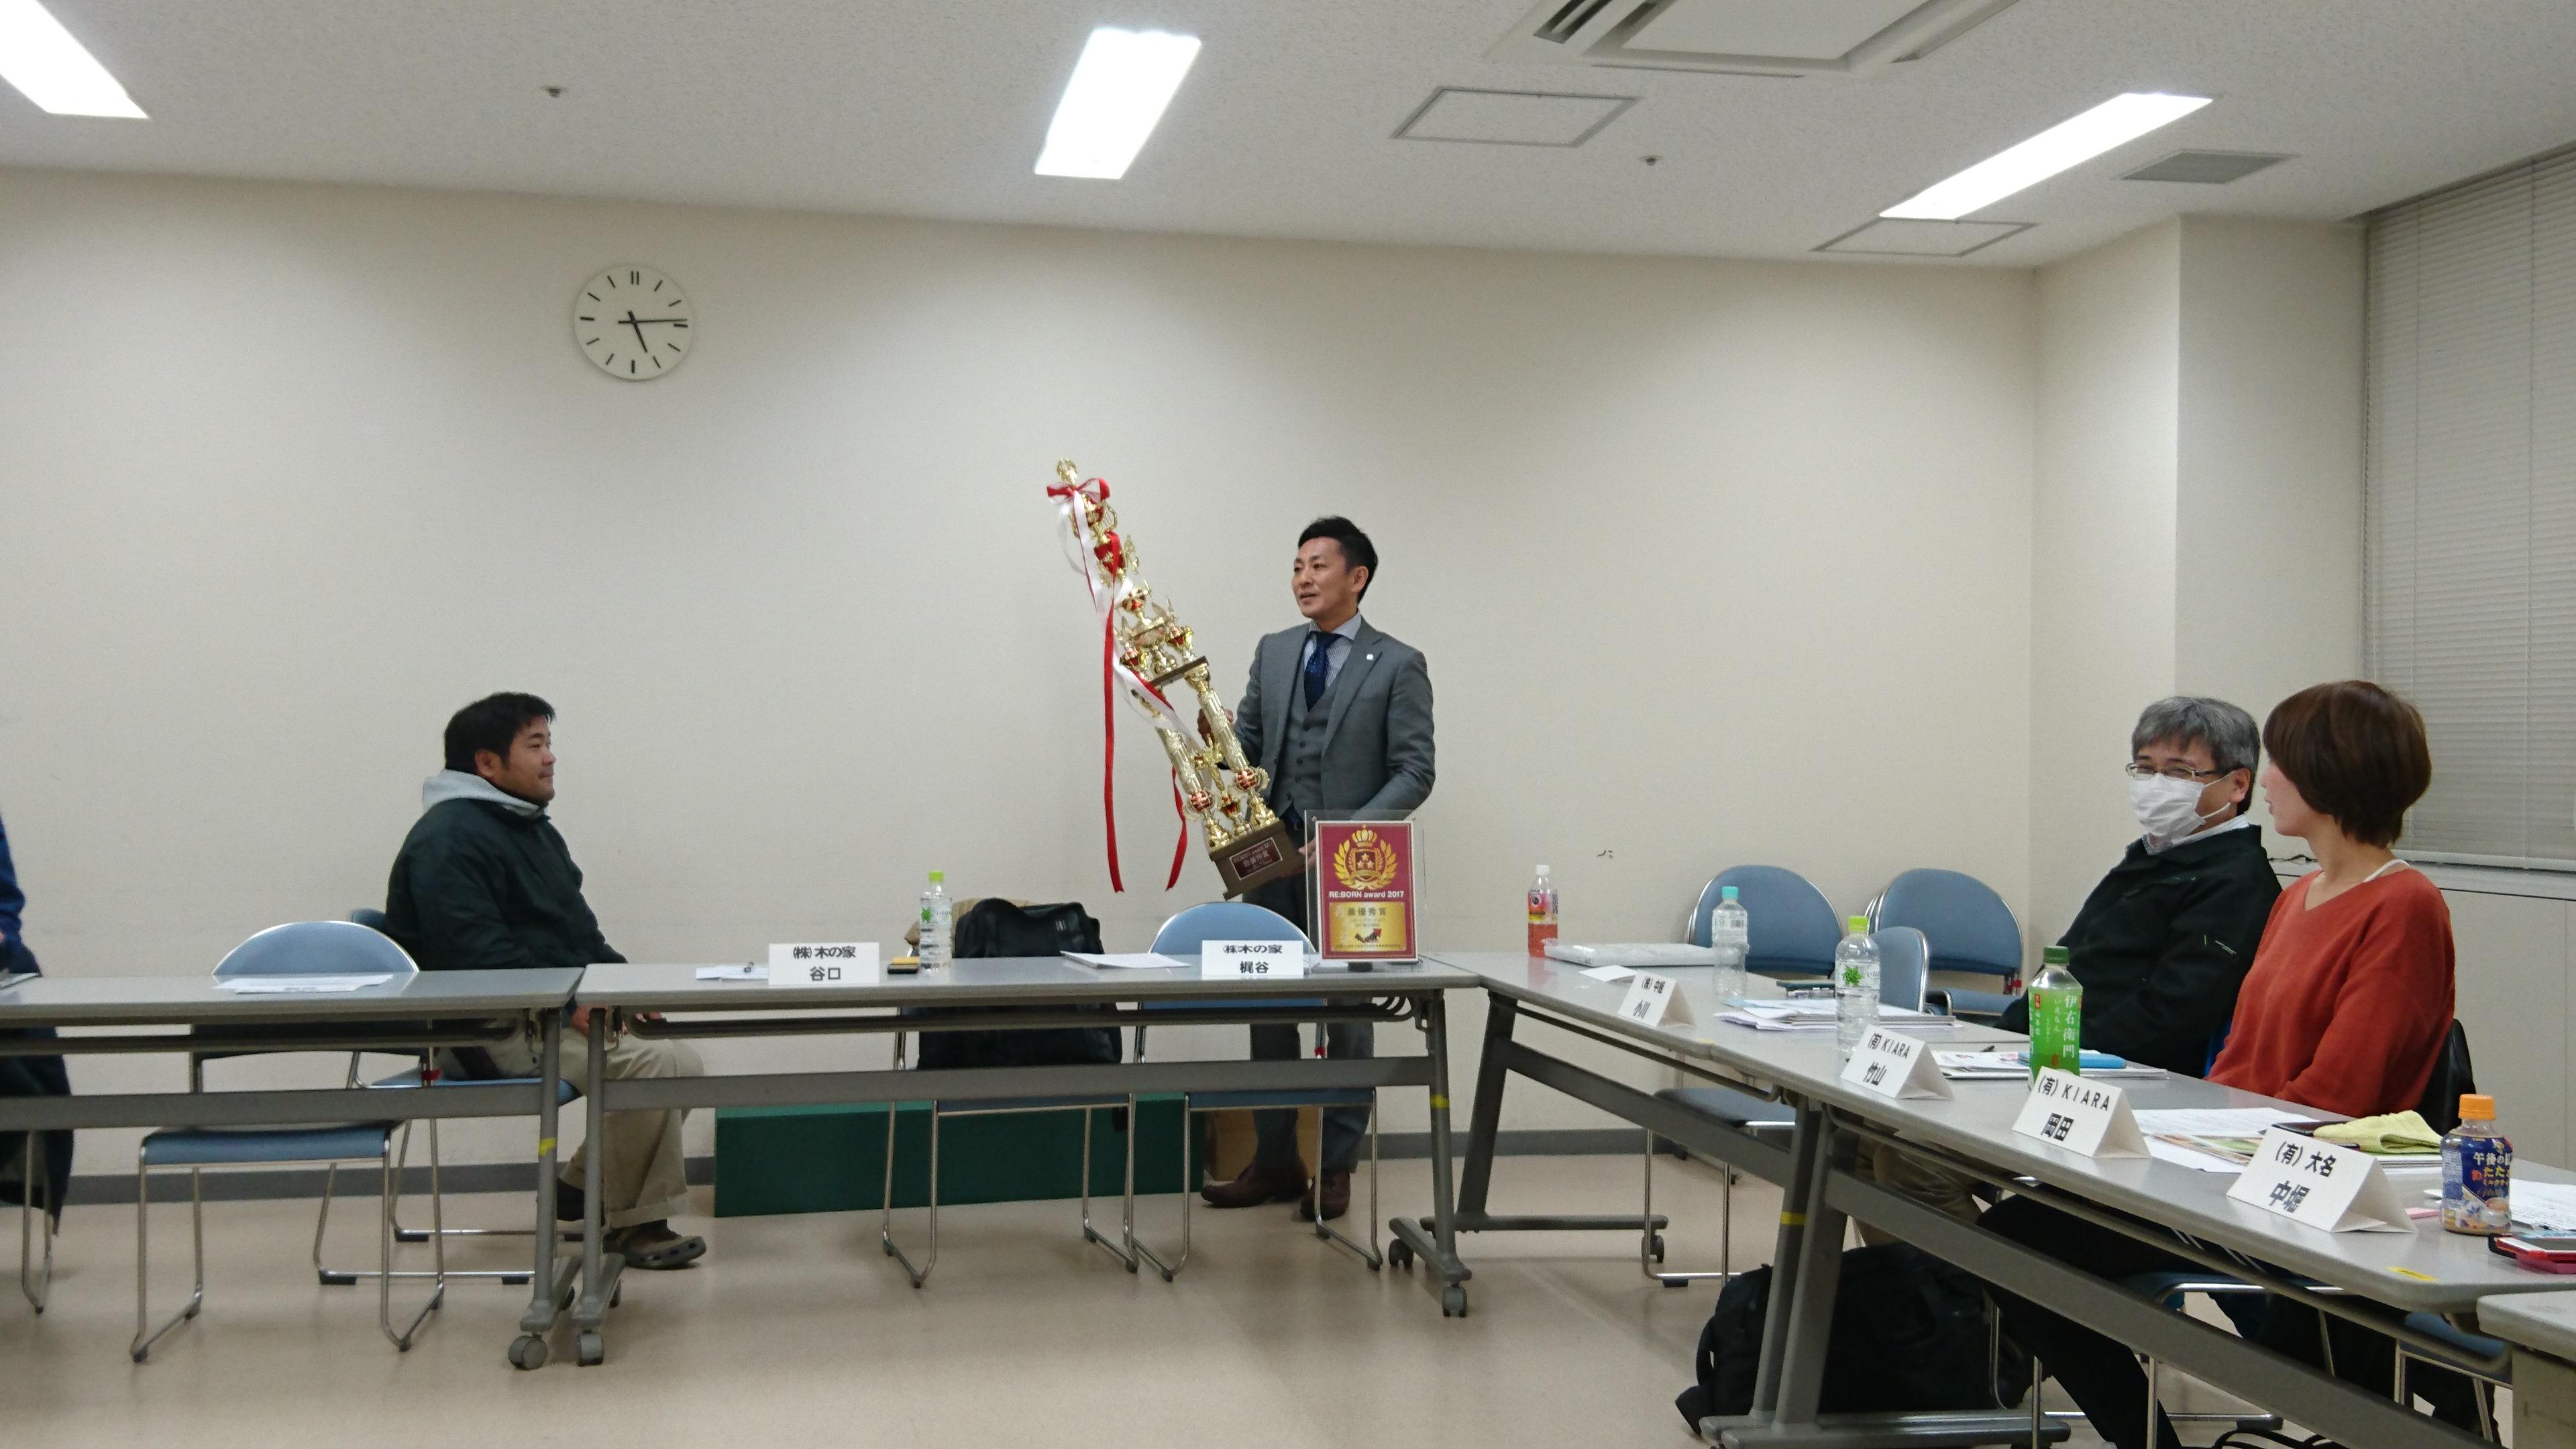 DSC_7340.JPG